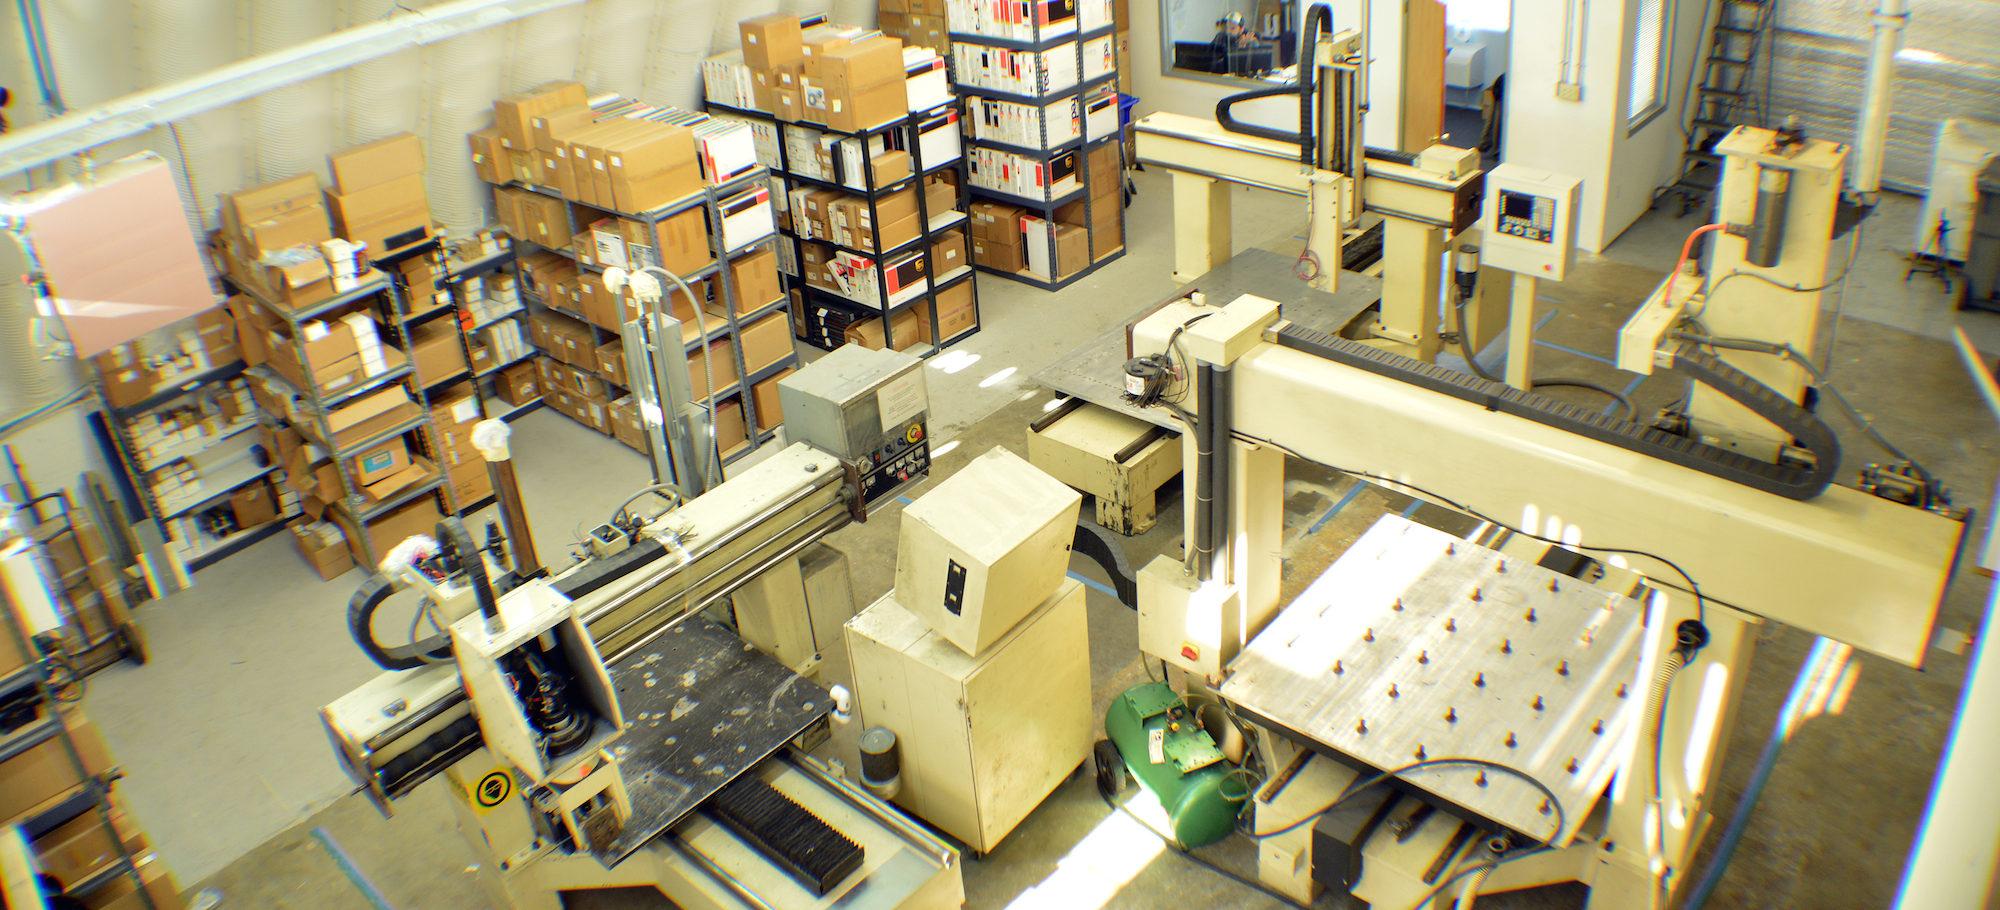 CNC Parts Dept Warehouse